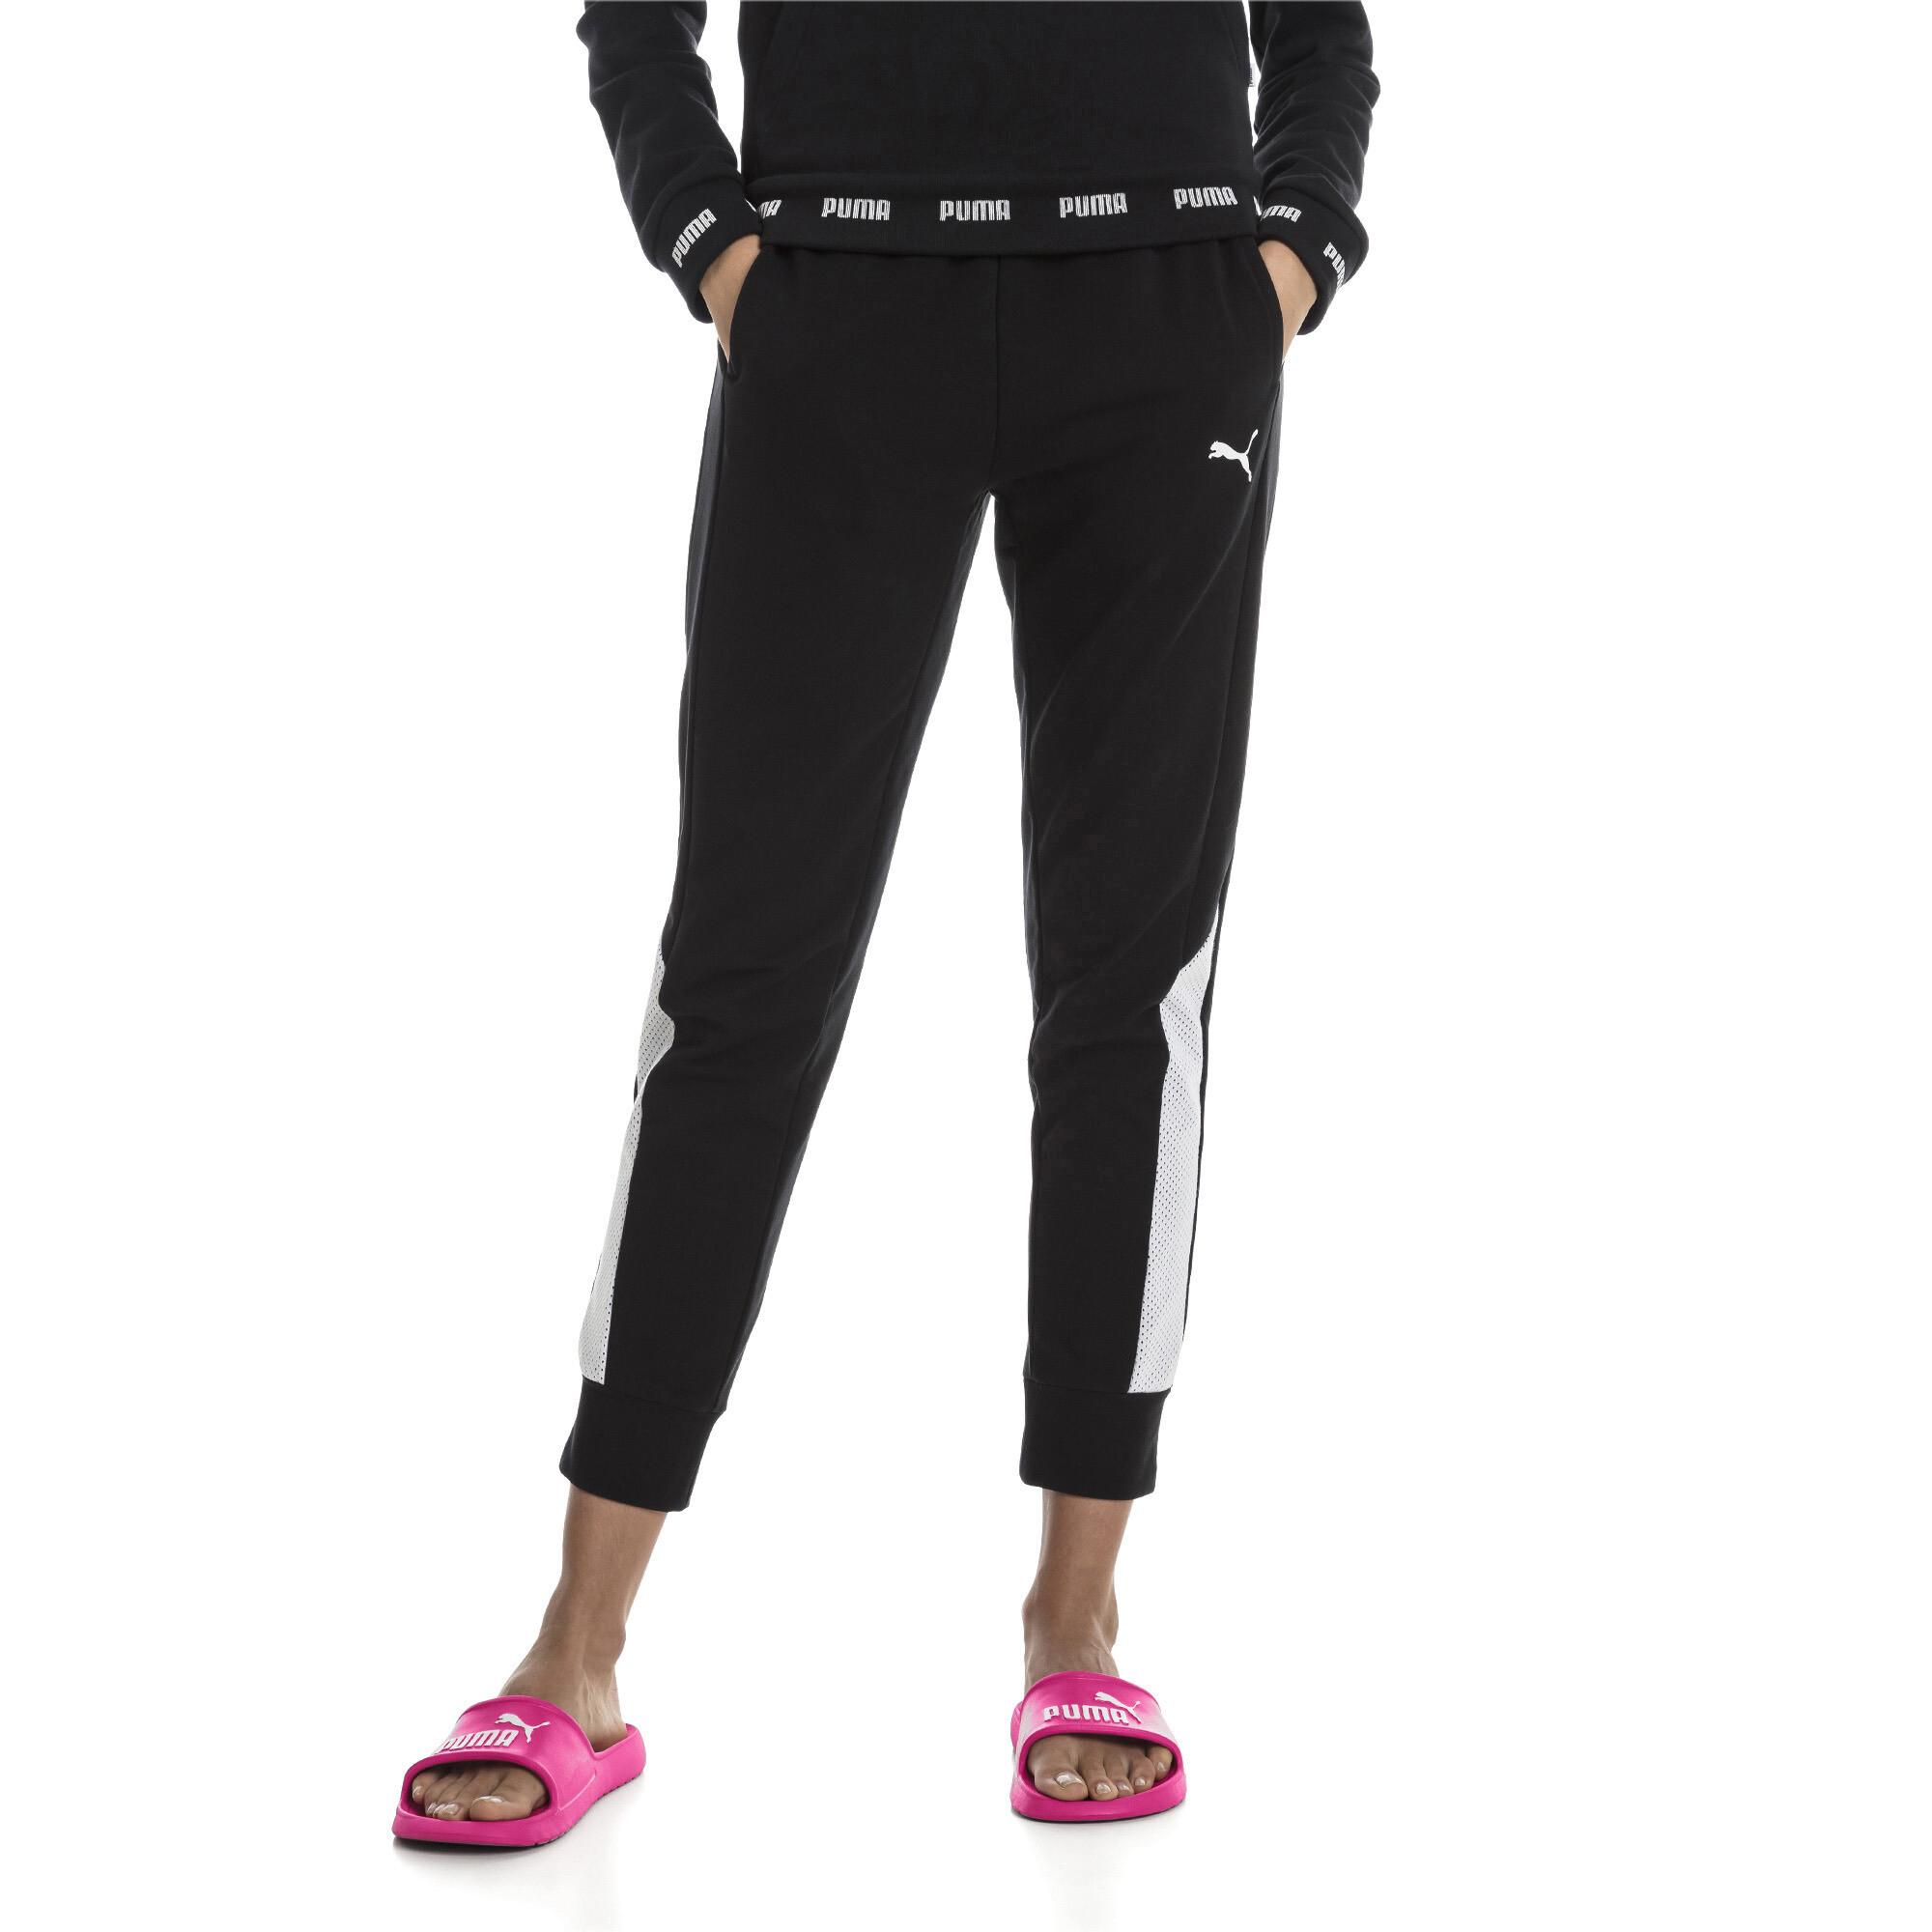 PUMA-Modern-Sports-Pants-Women-Knitted-Pants-Basics thumbnail 4